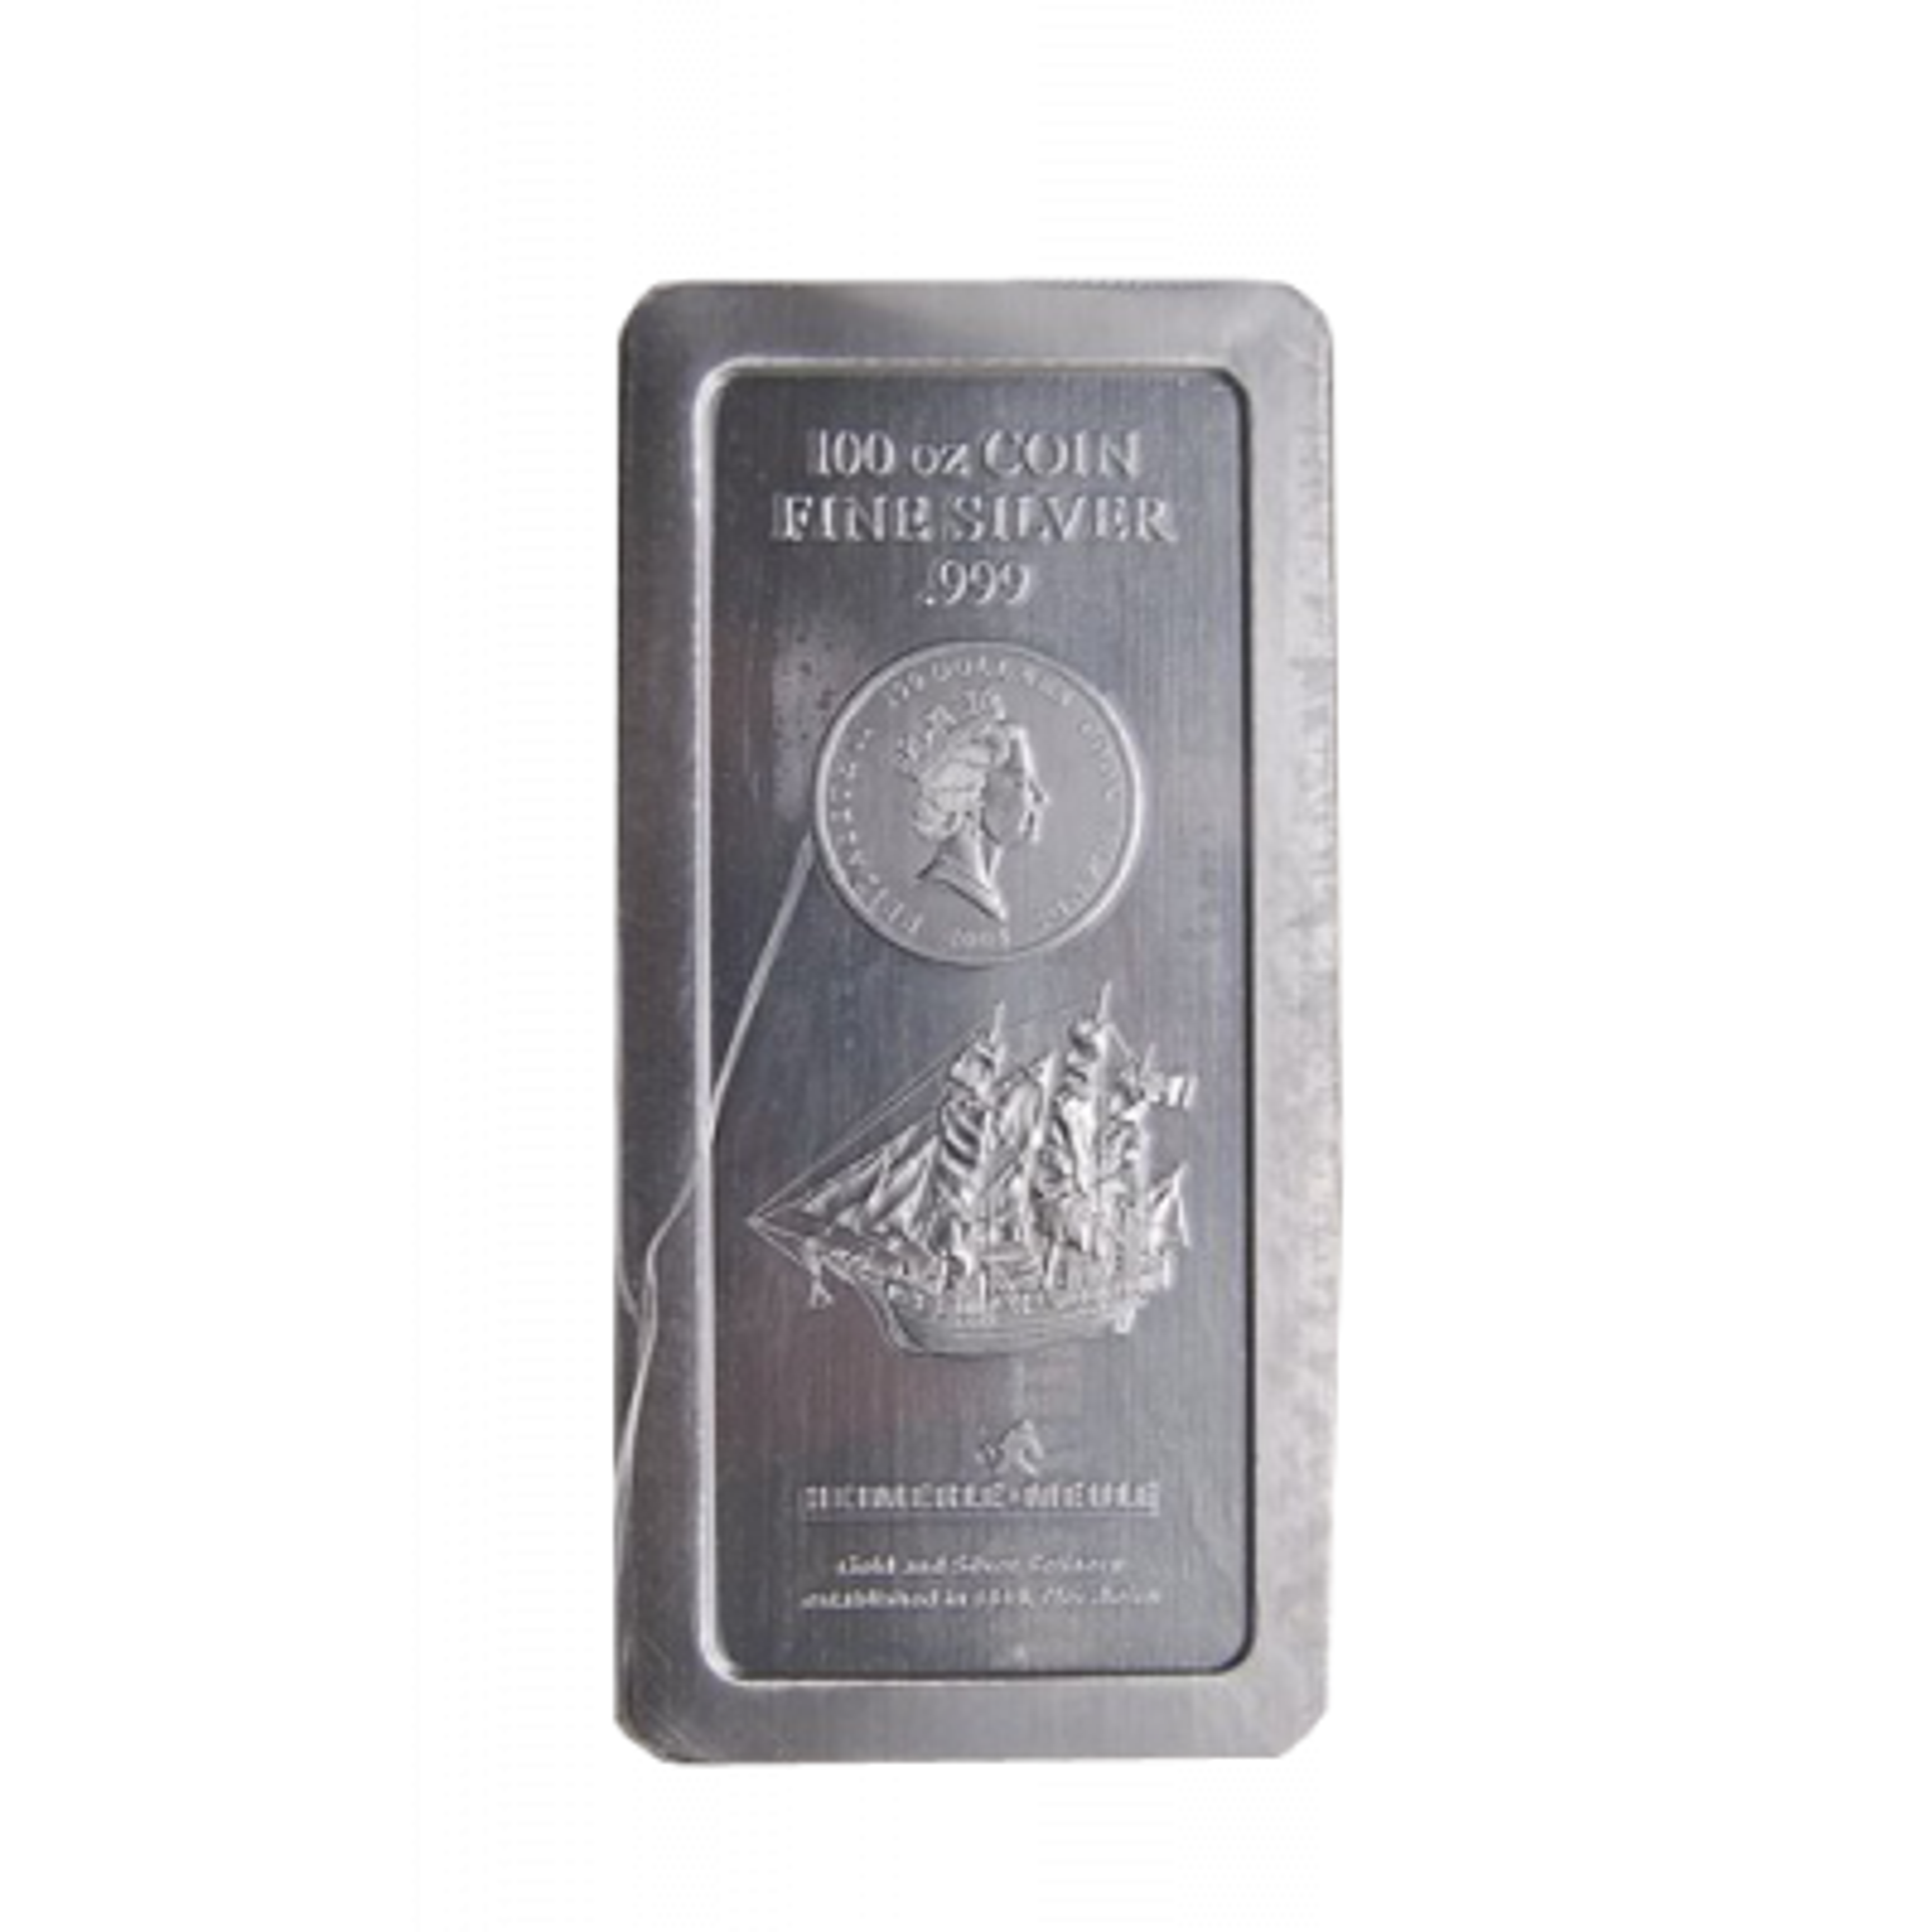 100 Troy Ounce Cook Islands Bounty silver coin bar